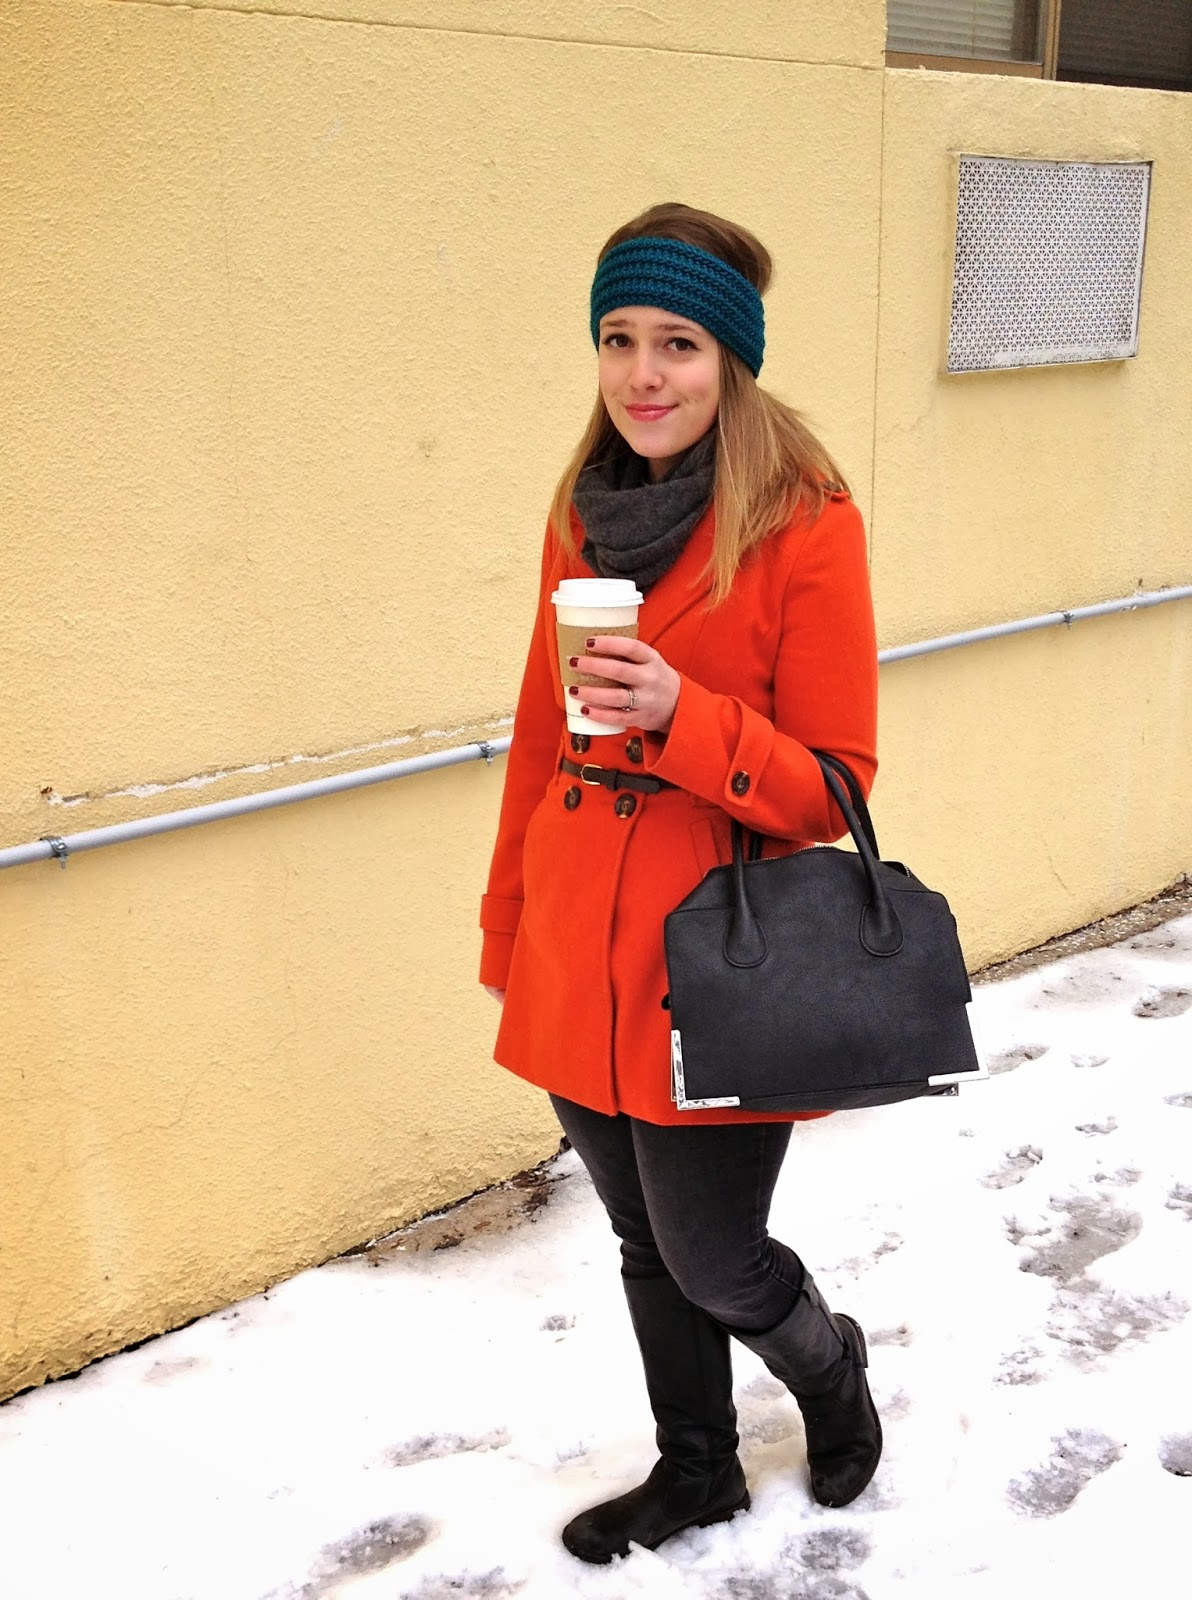 Black and orange winter jacket